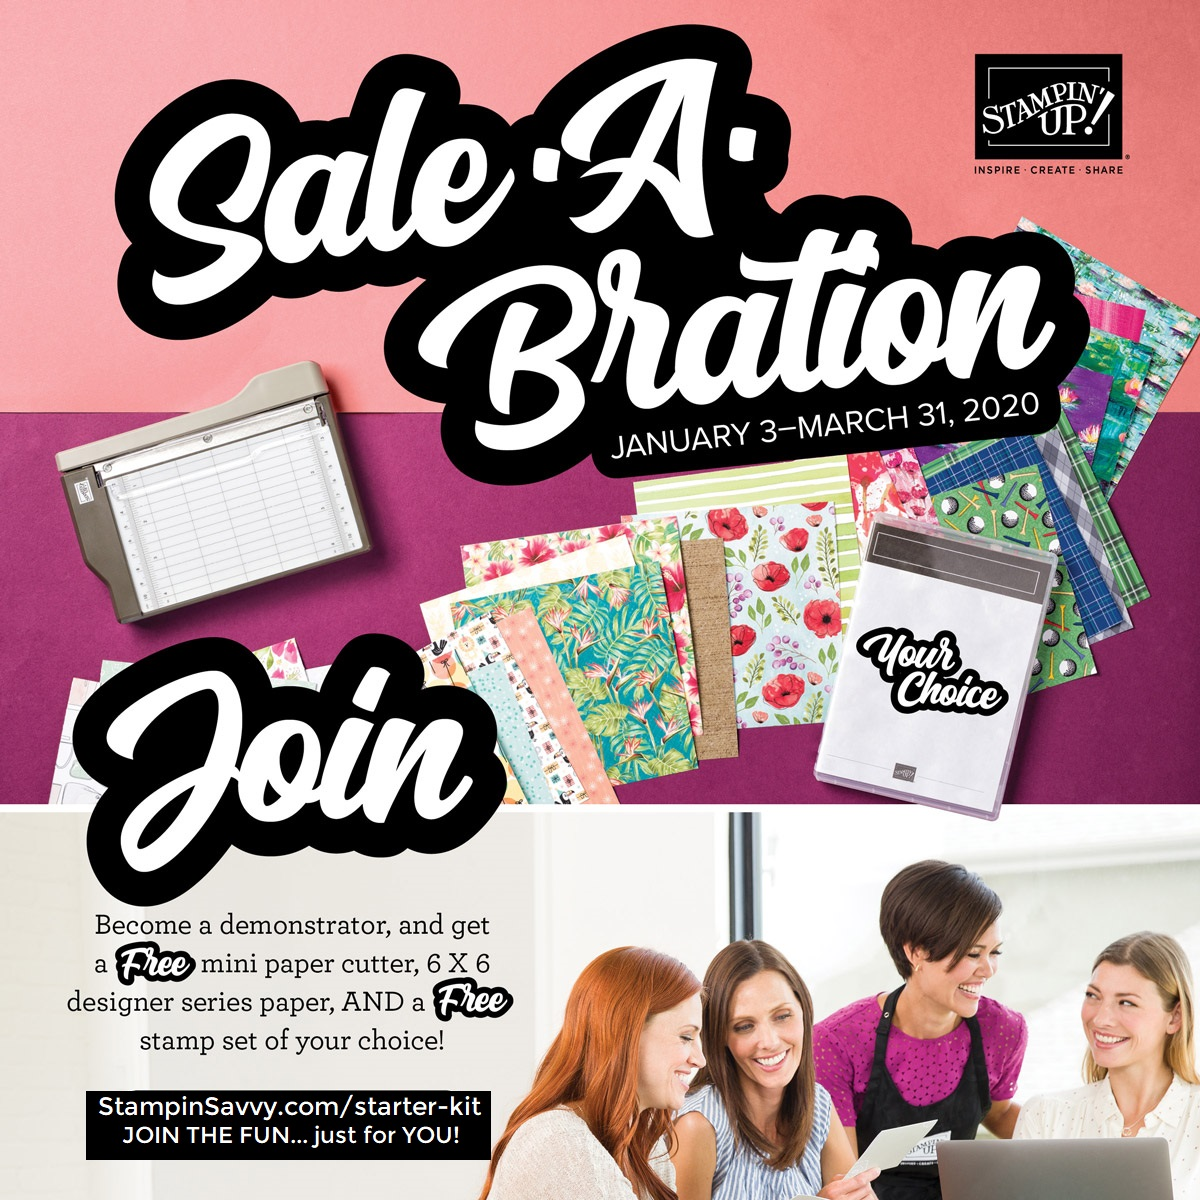 Sale-A-Bration Starter Kit Bonus- Order StampinSavvy.com/Starter-kit